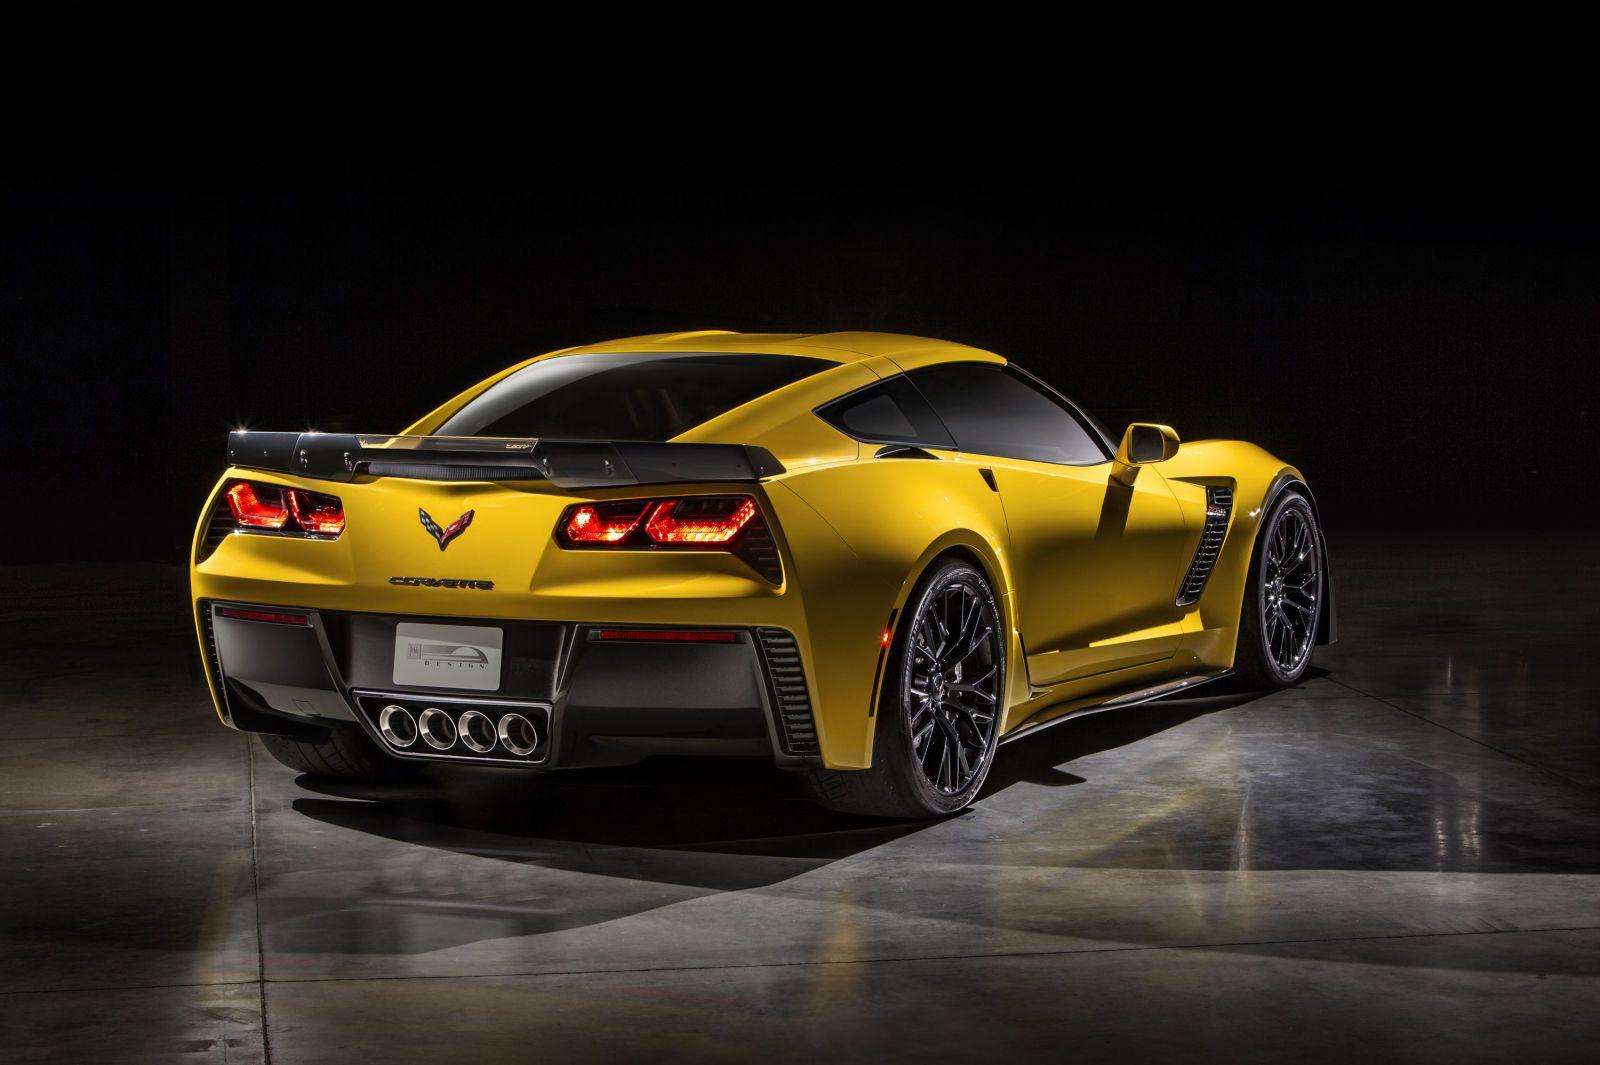 Why the New Z06 Is the Ultimate Corvette  - PopularMechanics.com